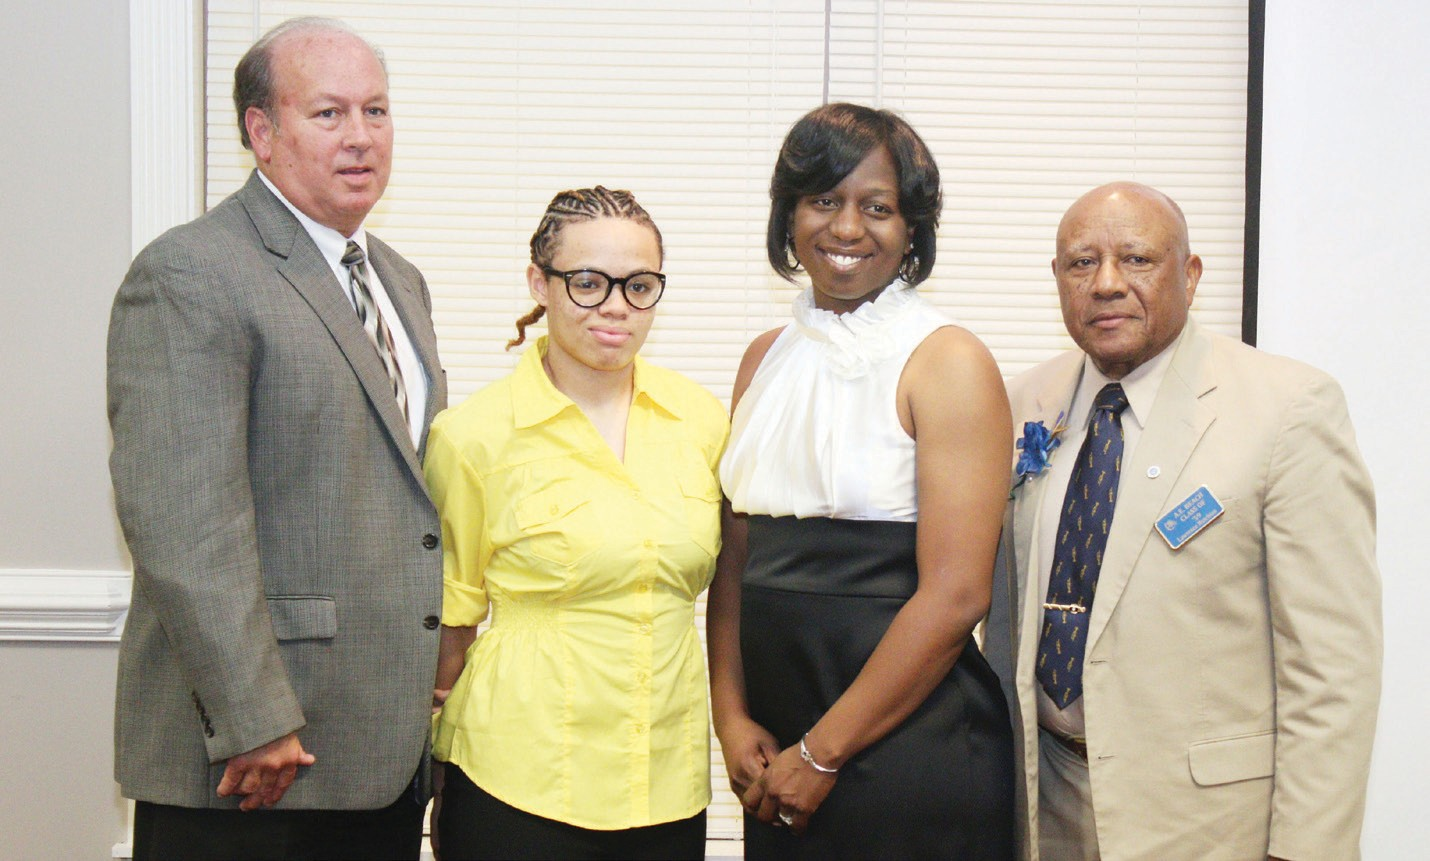 Dewey DeLettre, Jacqueline Anderson, Olufemi Gordon and Lawrence Hutchins, Jr.